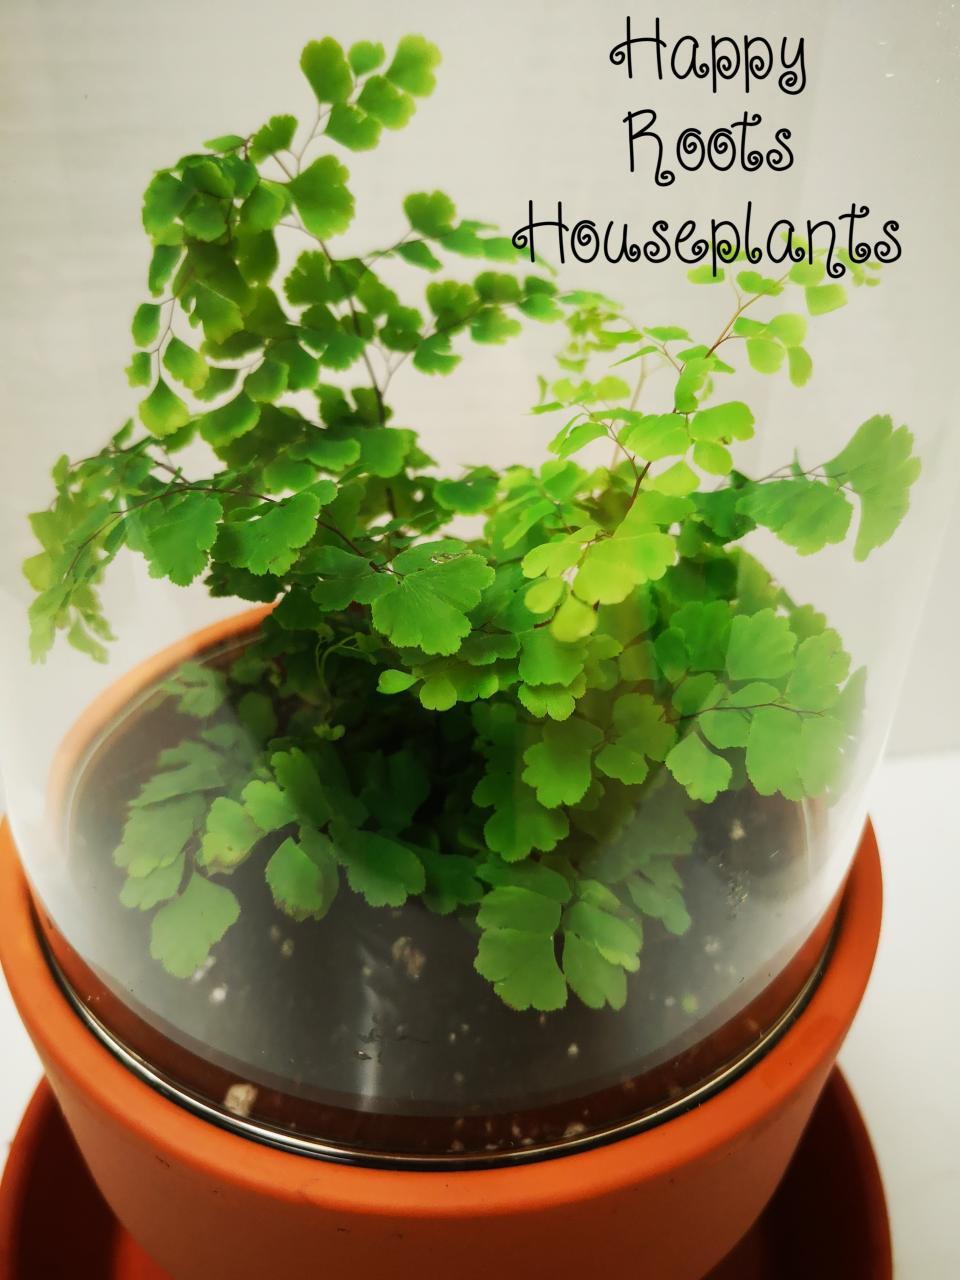 Maidenhair Fern in cloche - Happy Roots Houseplants - Kingston Indoor Plant Shop